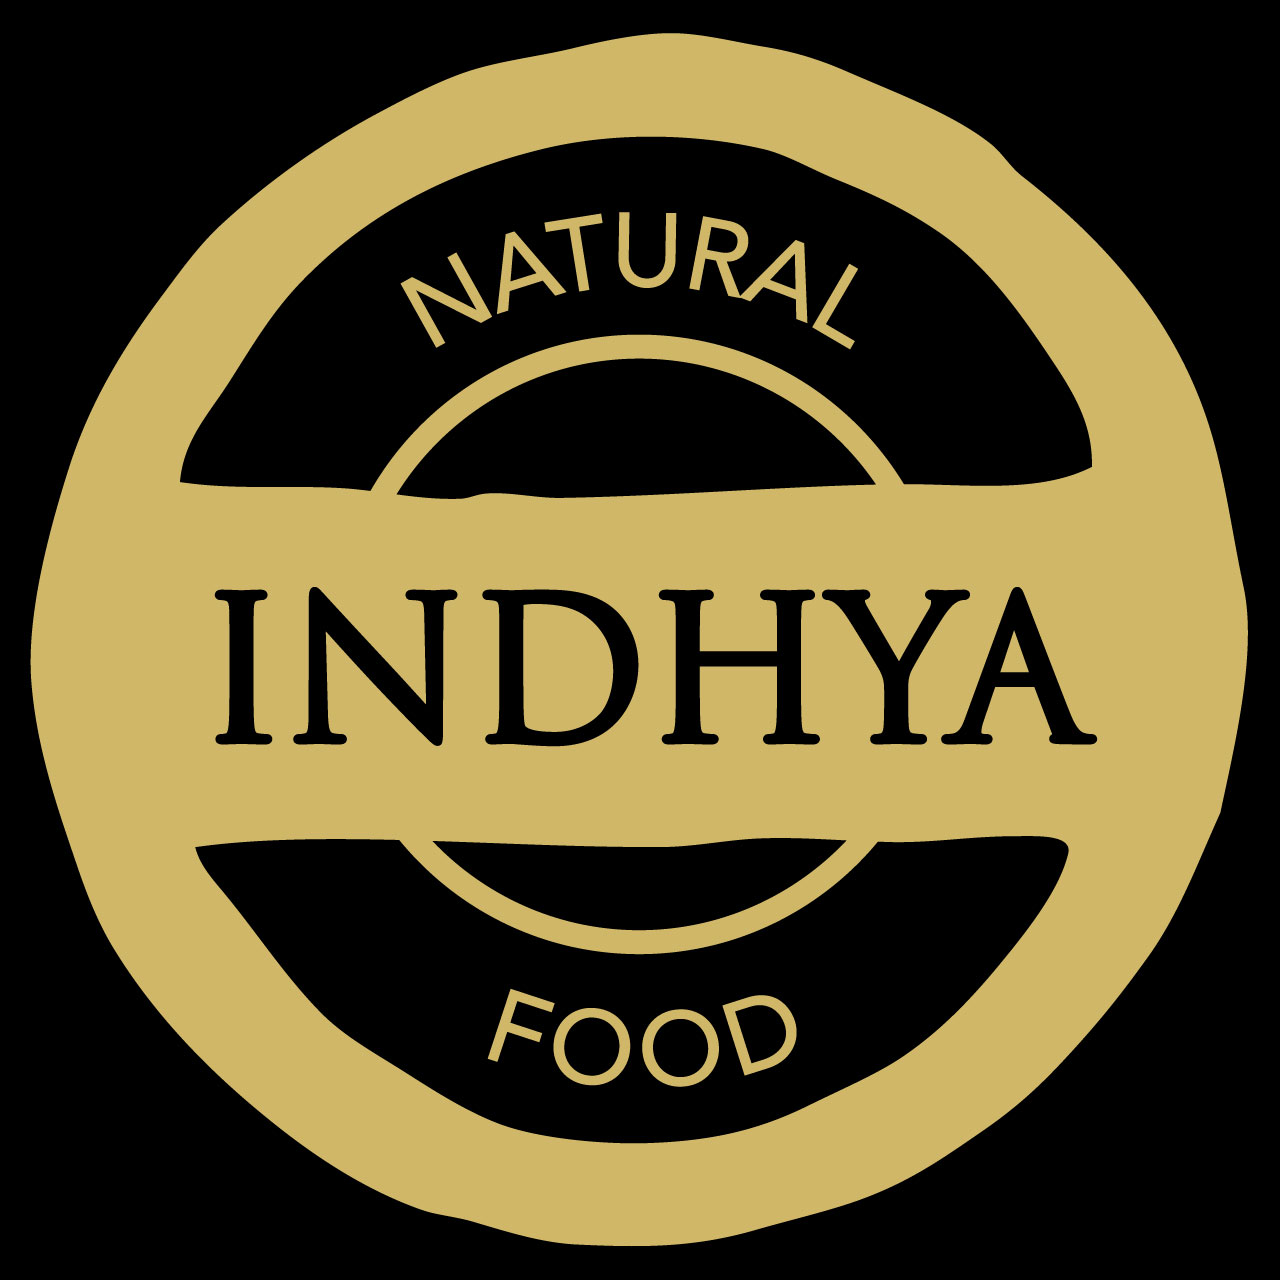 indhya_1280x120pix-2.jpg?fit=1280%2C1280&s